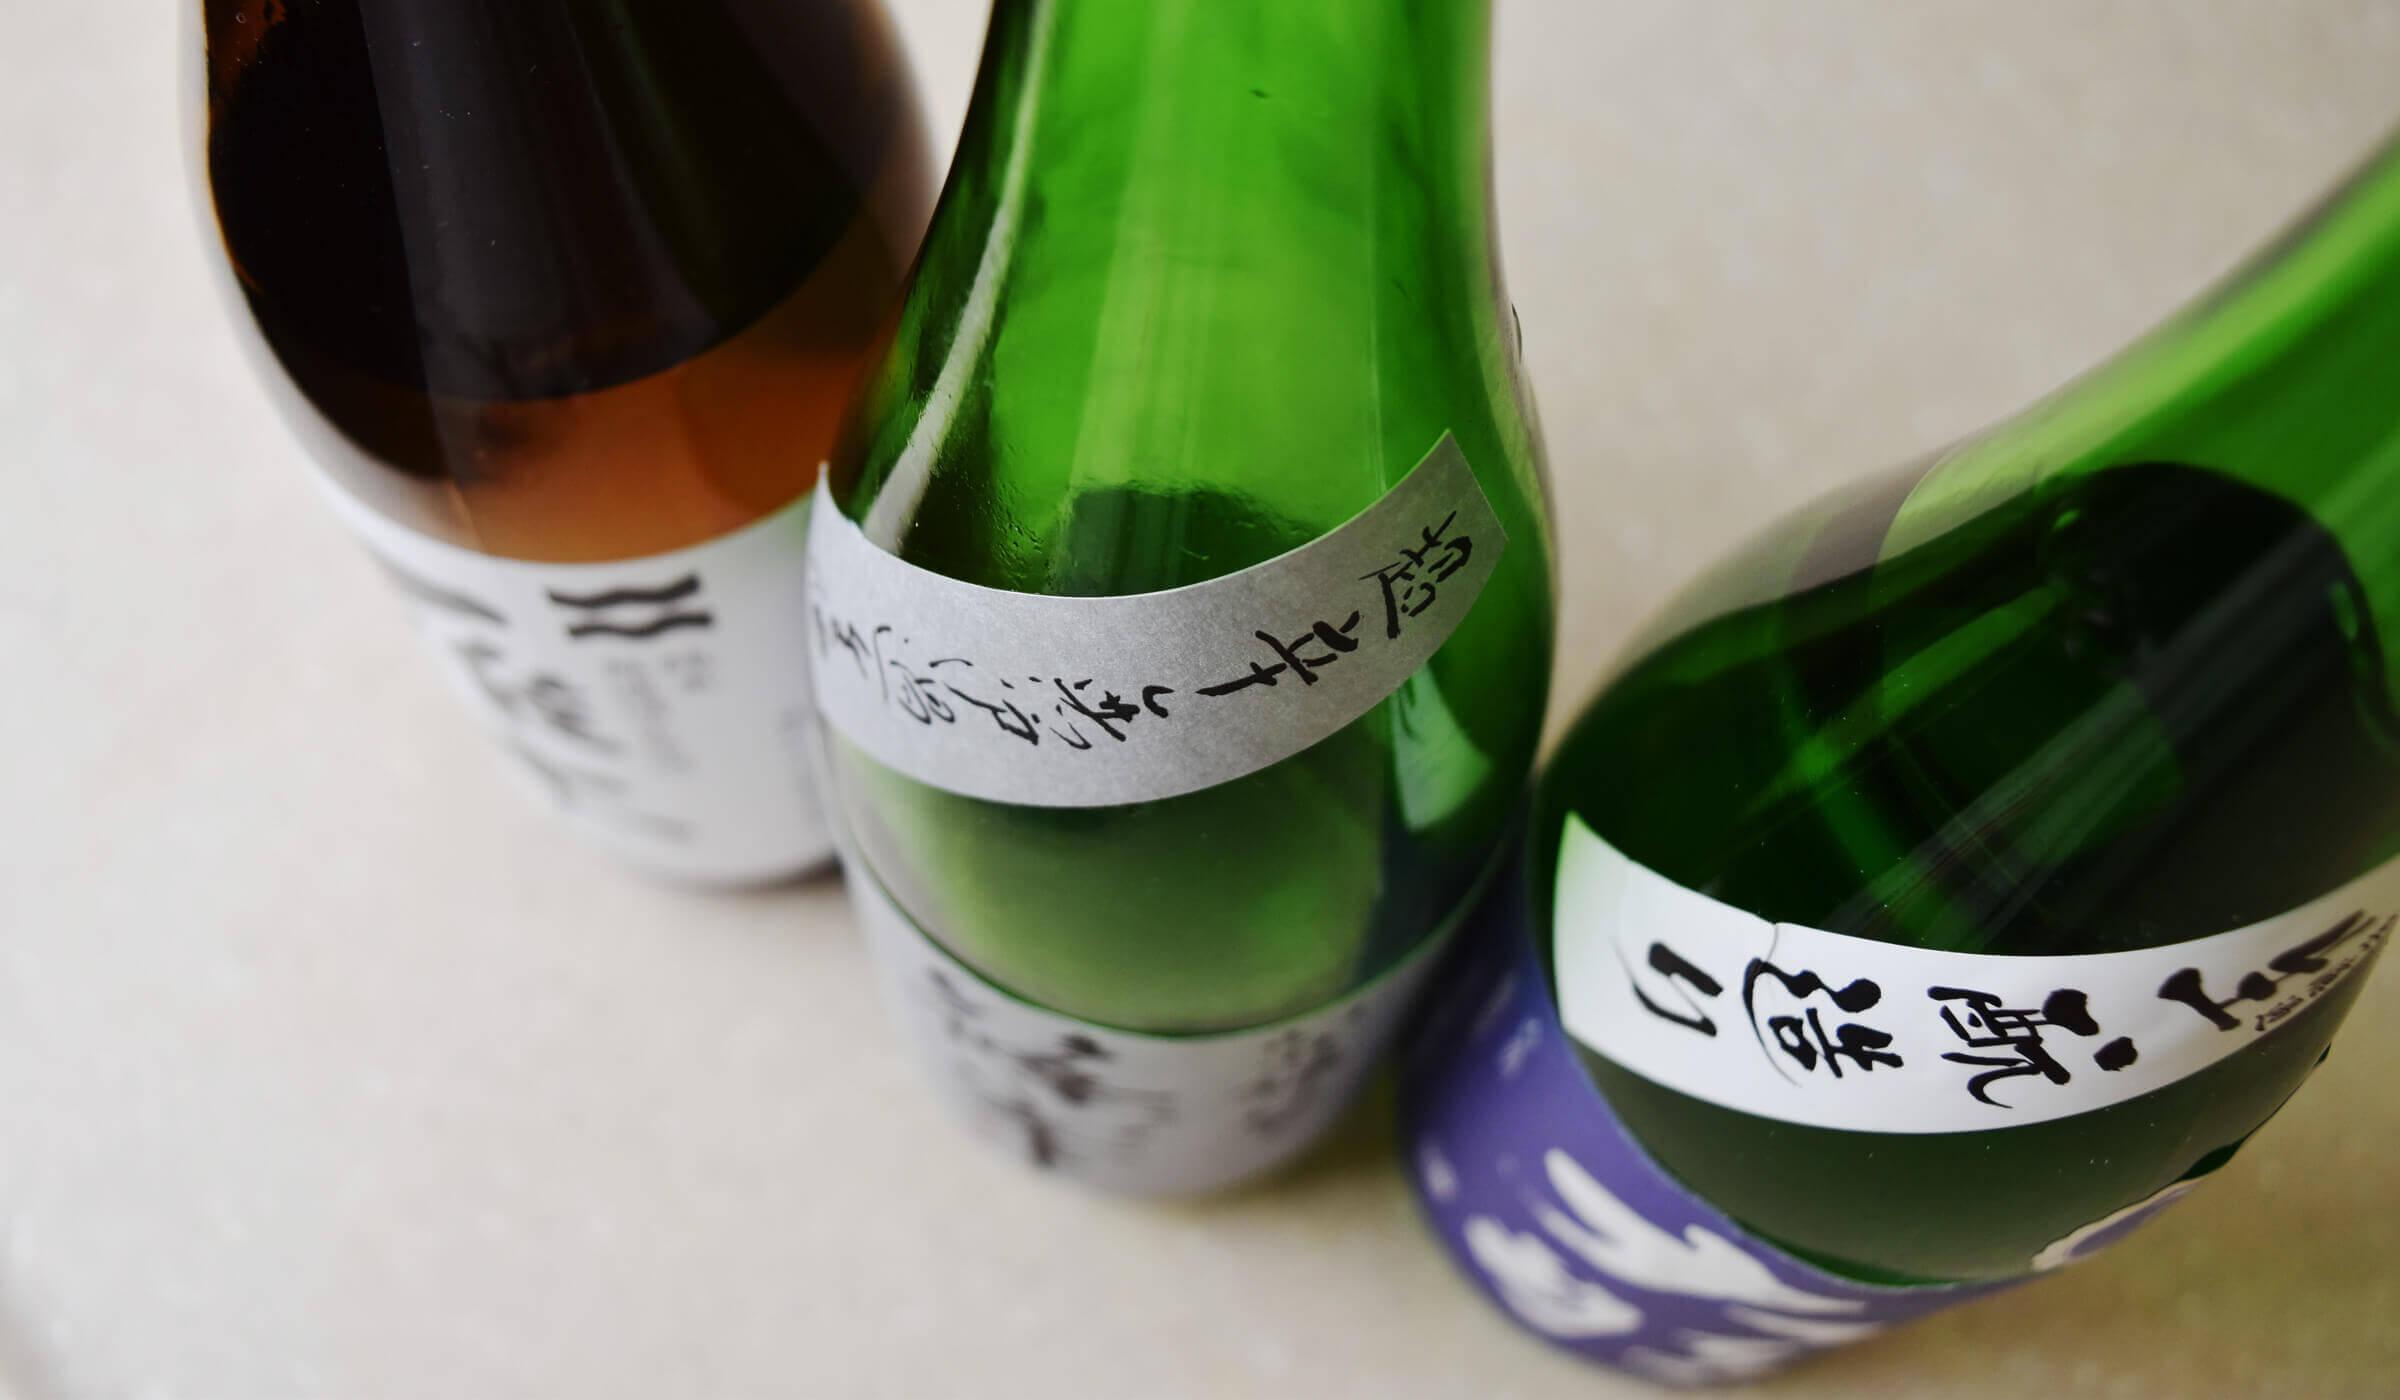 Summer Limited Sake Tasting & Workshop Thu, 18 Aug, 2016 ...